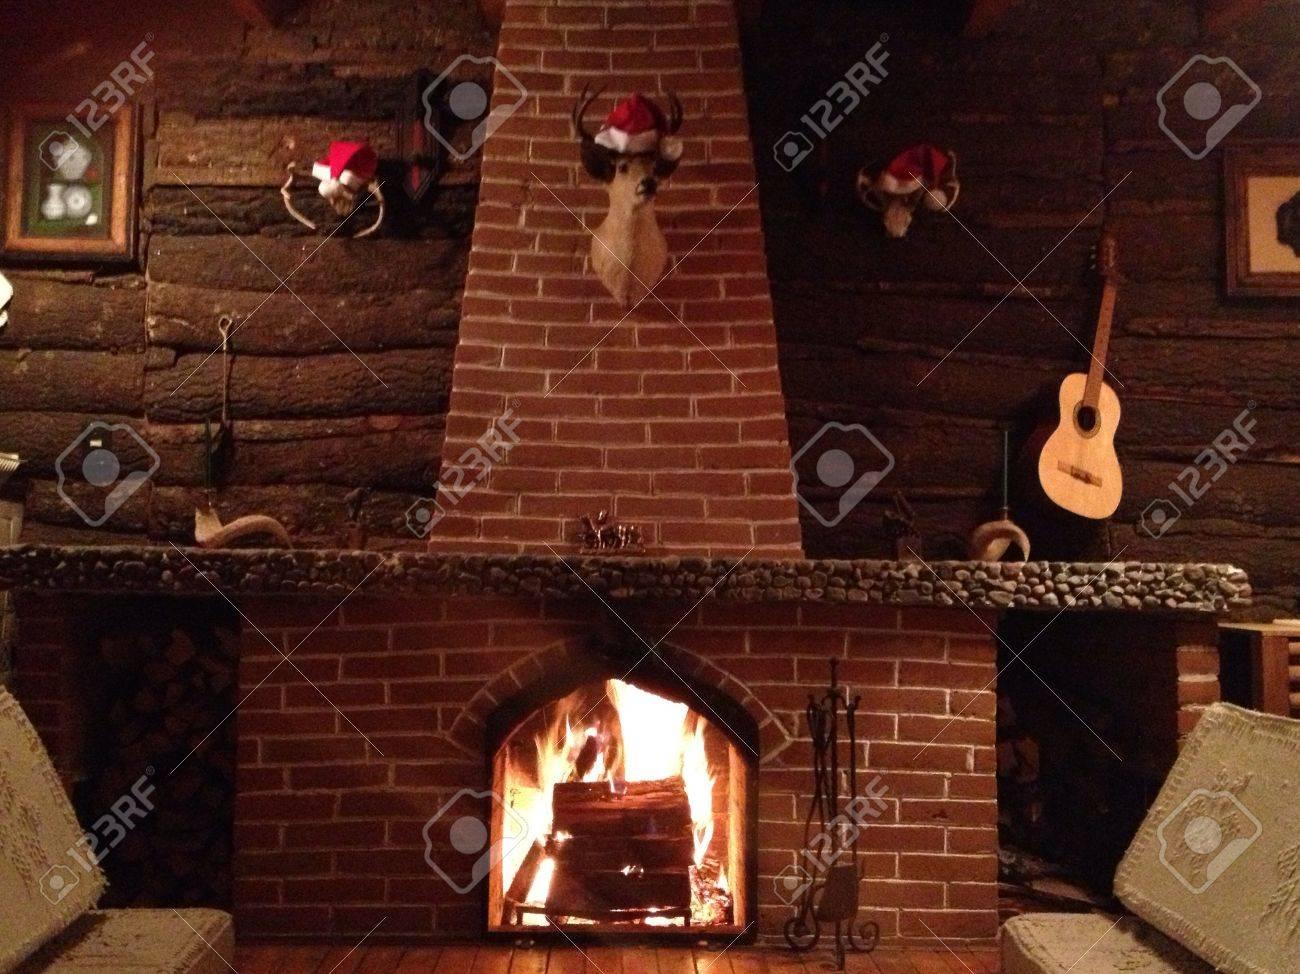 Light up christmas seasonal fireplace on a sunday night. Stock Photo - 20828197